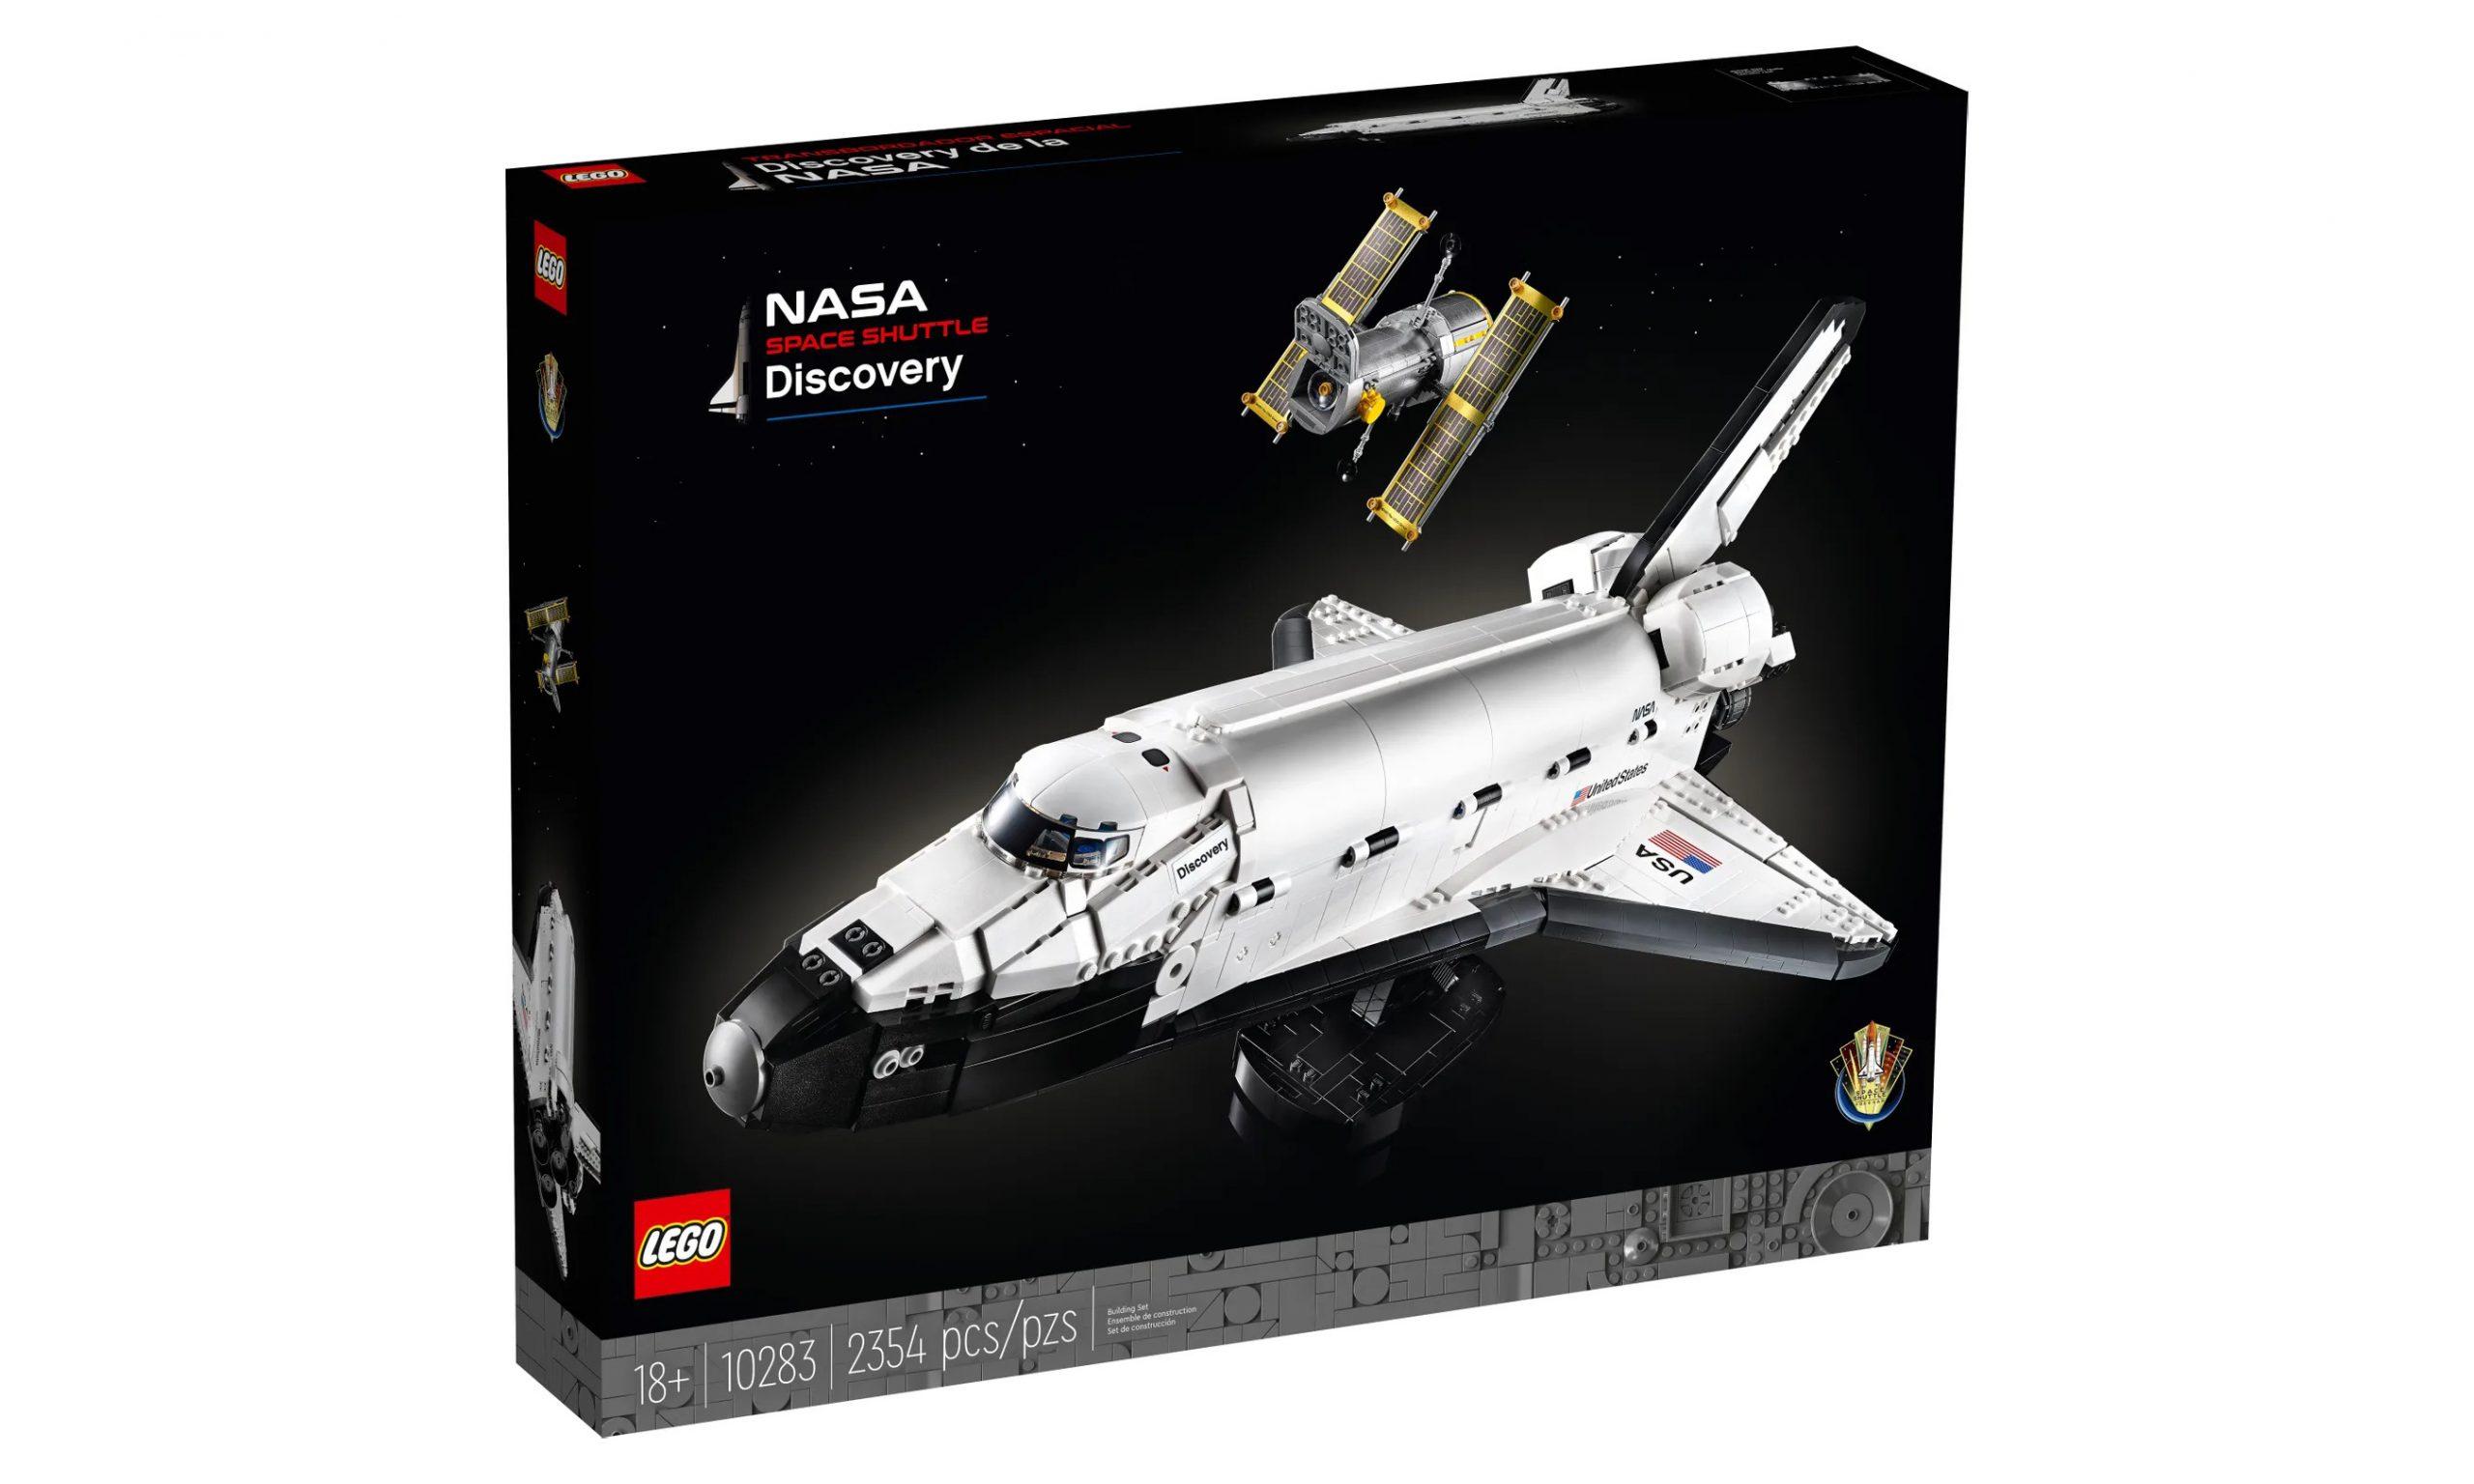 LEGO 推出 10283 NASA 发现号太空飞船盒组